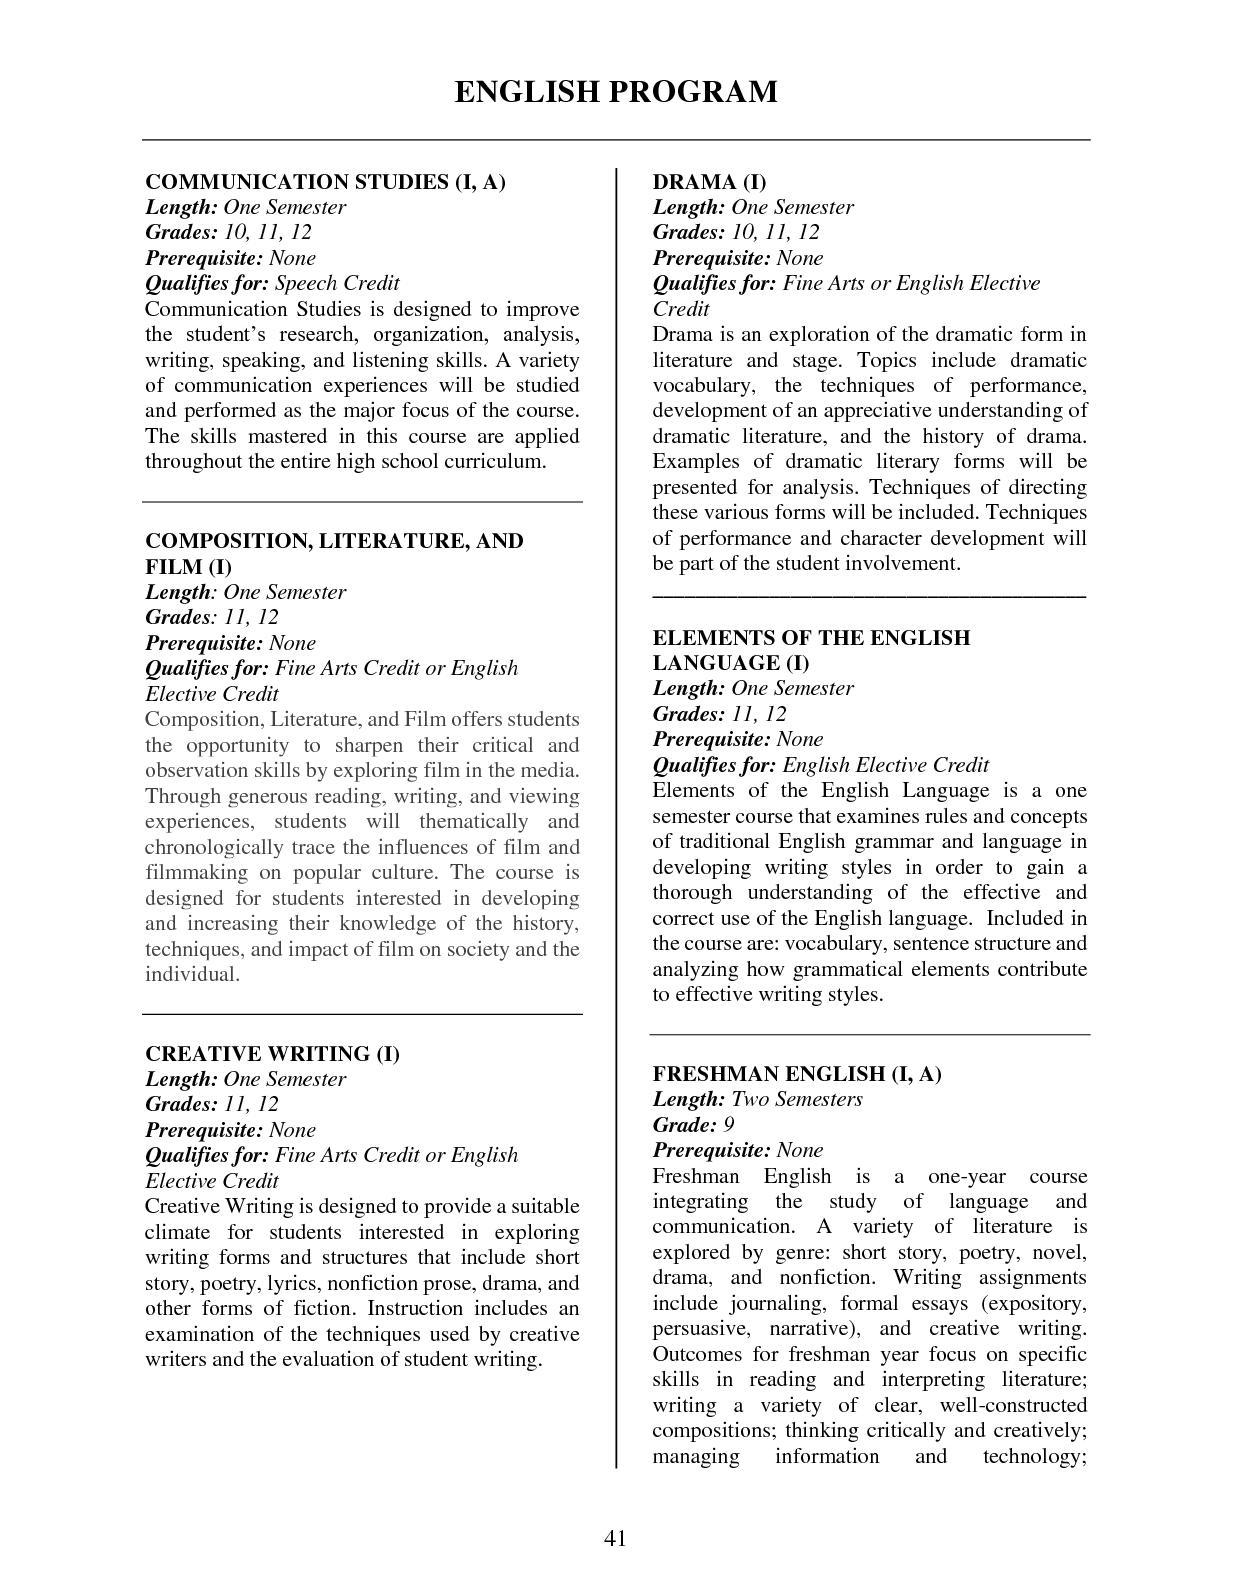 2018 19 High School Course Catalog - CALAMEO Downloader